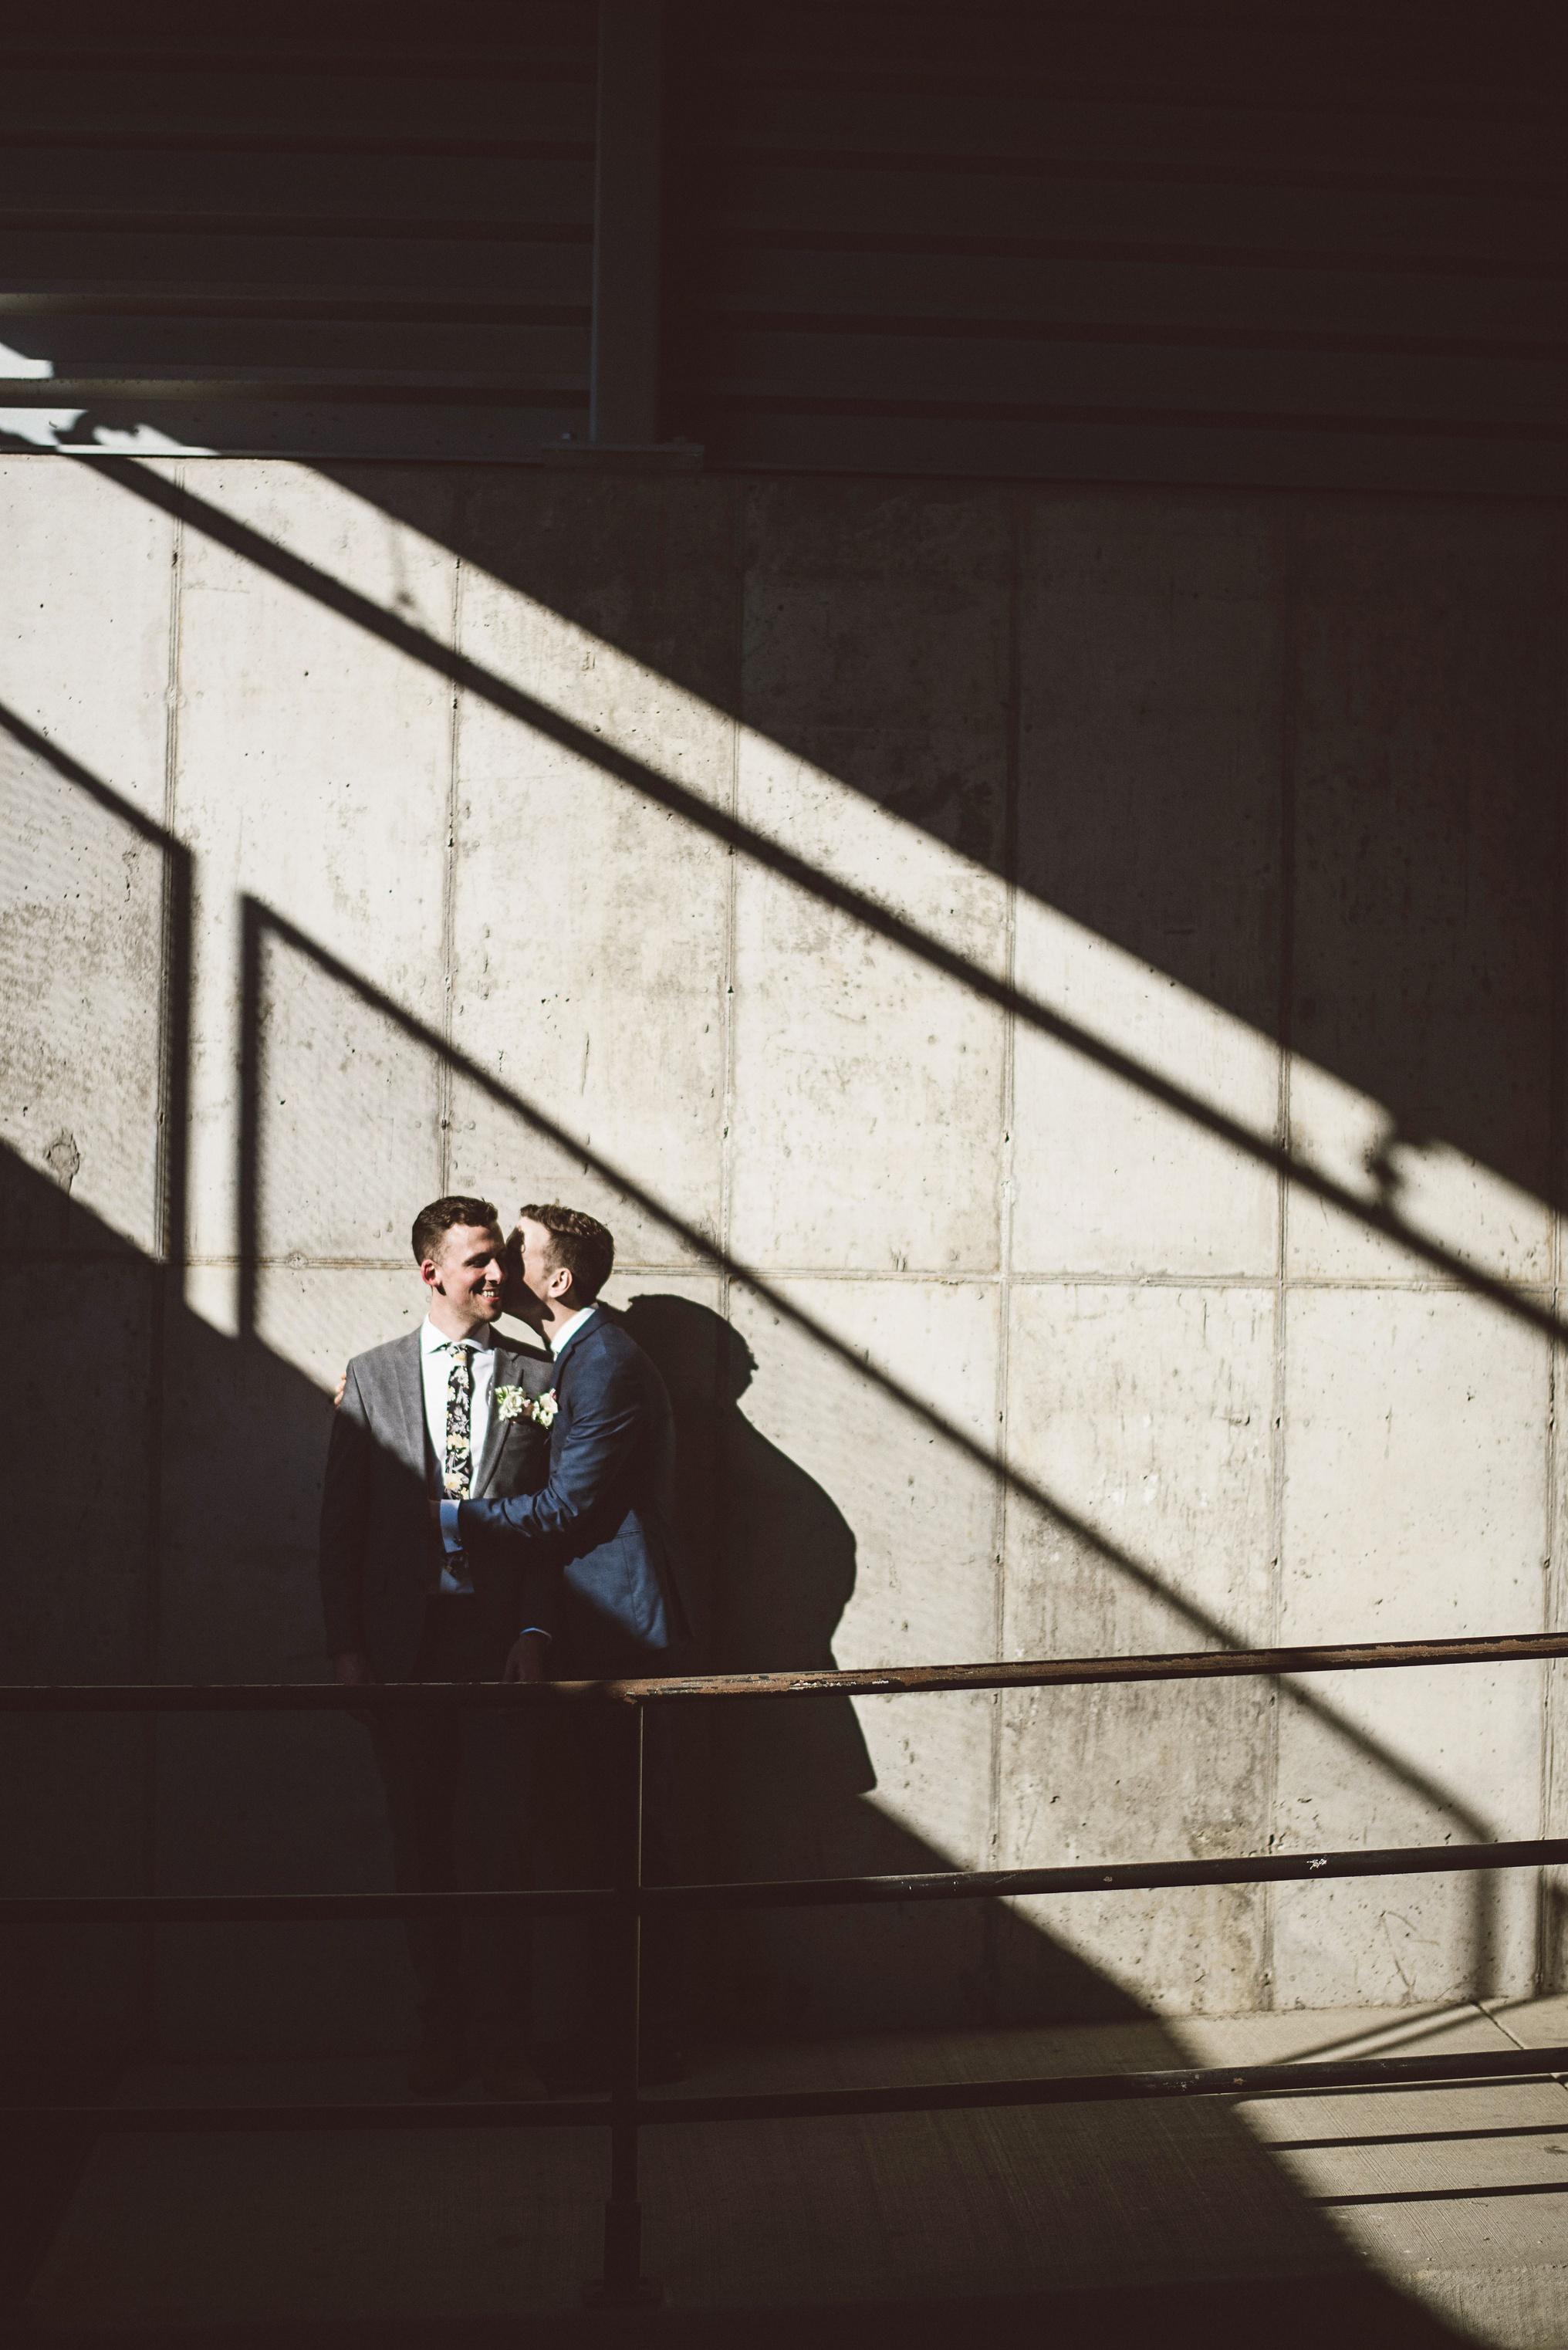 best_wedding_photography_2017_by_lucas_botz_photography_233.jpg